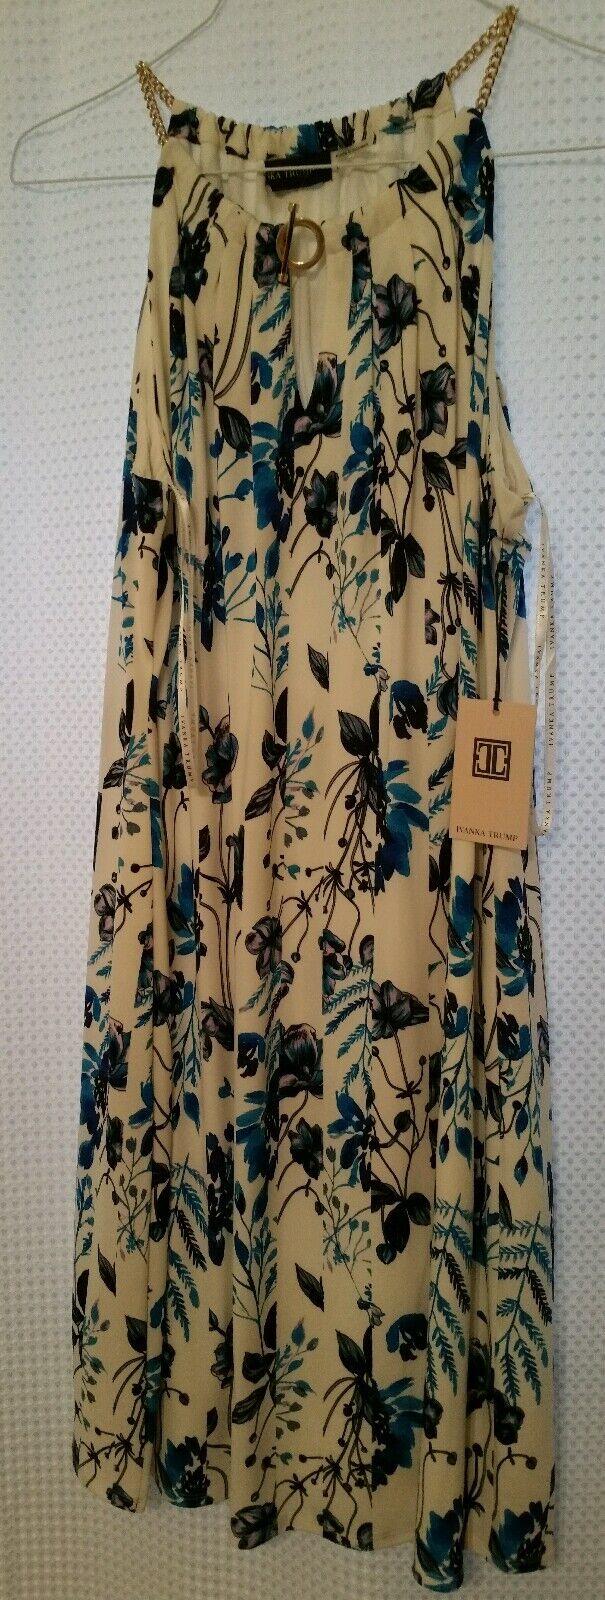 New IVANKA TRUMP Floral Sleeveless Dress w  Gold Chain Straps & Accent Sz L NWT